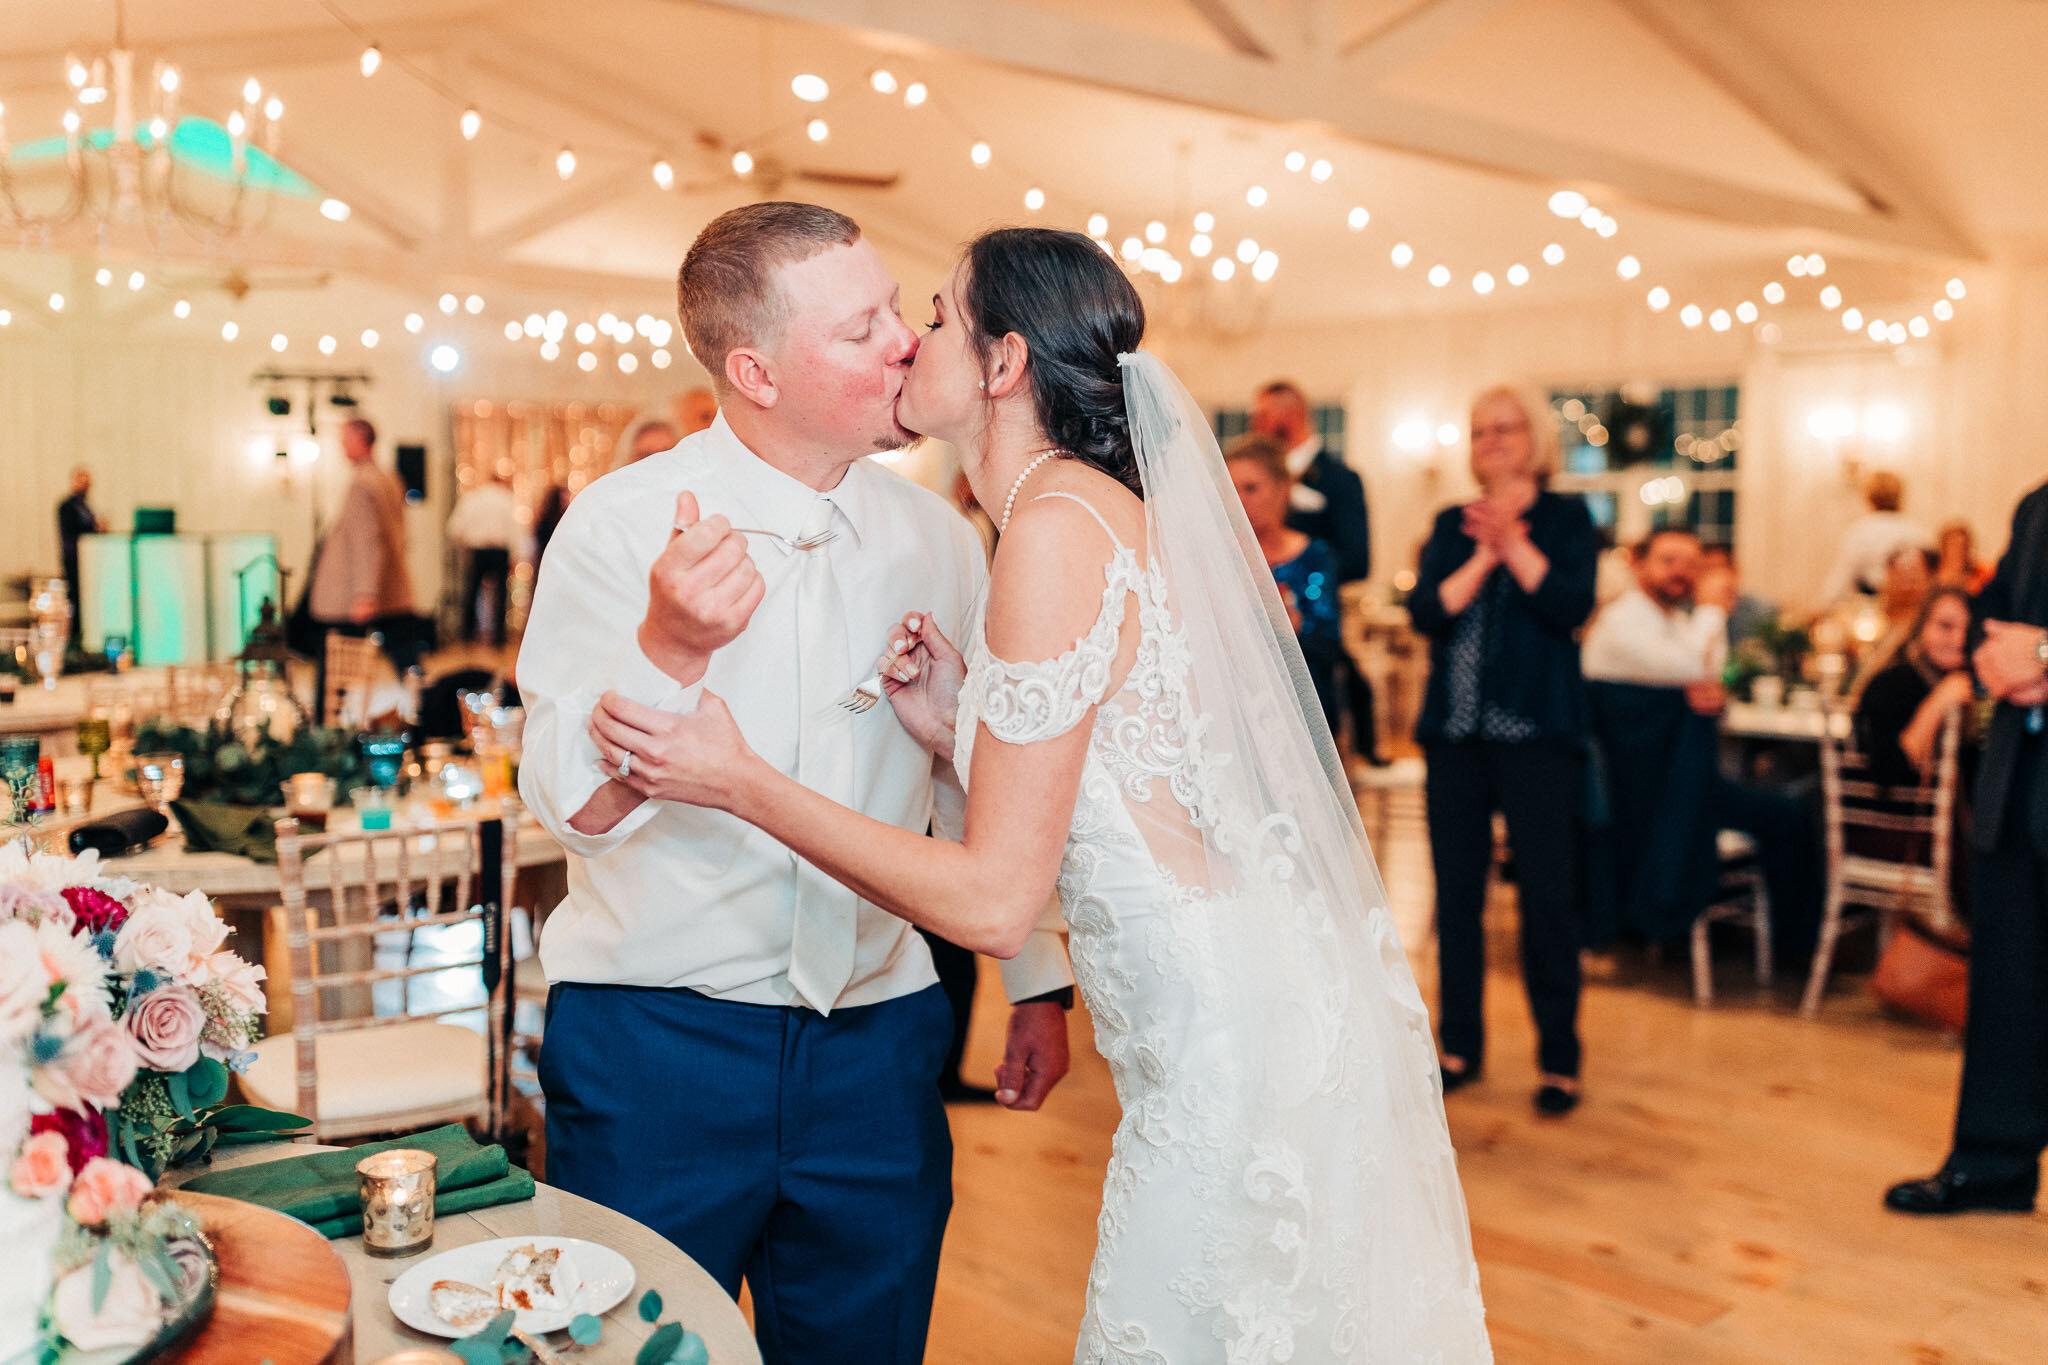 whitewoods-fall-wedding-8628.jpg